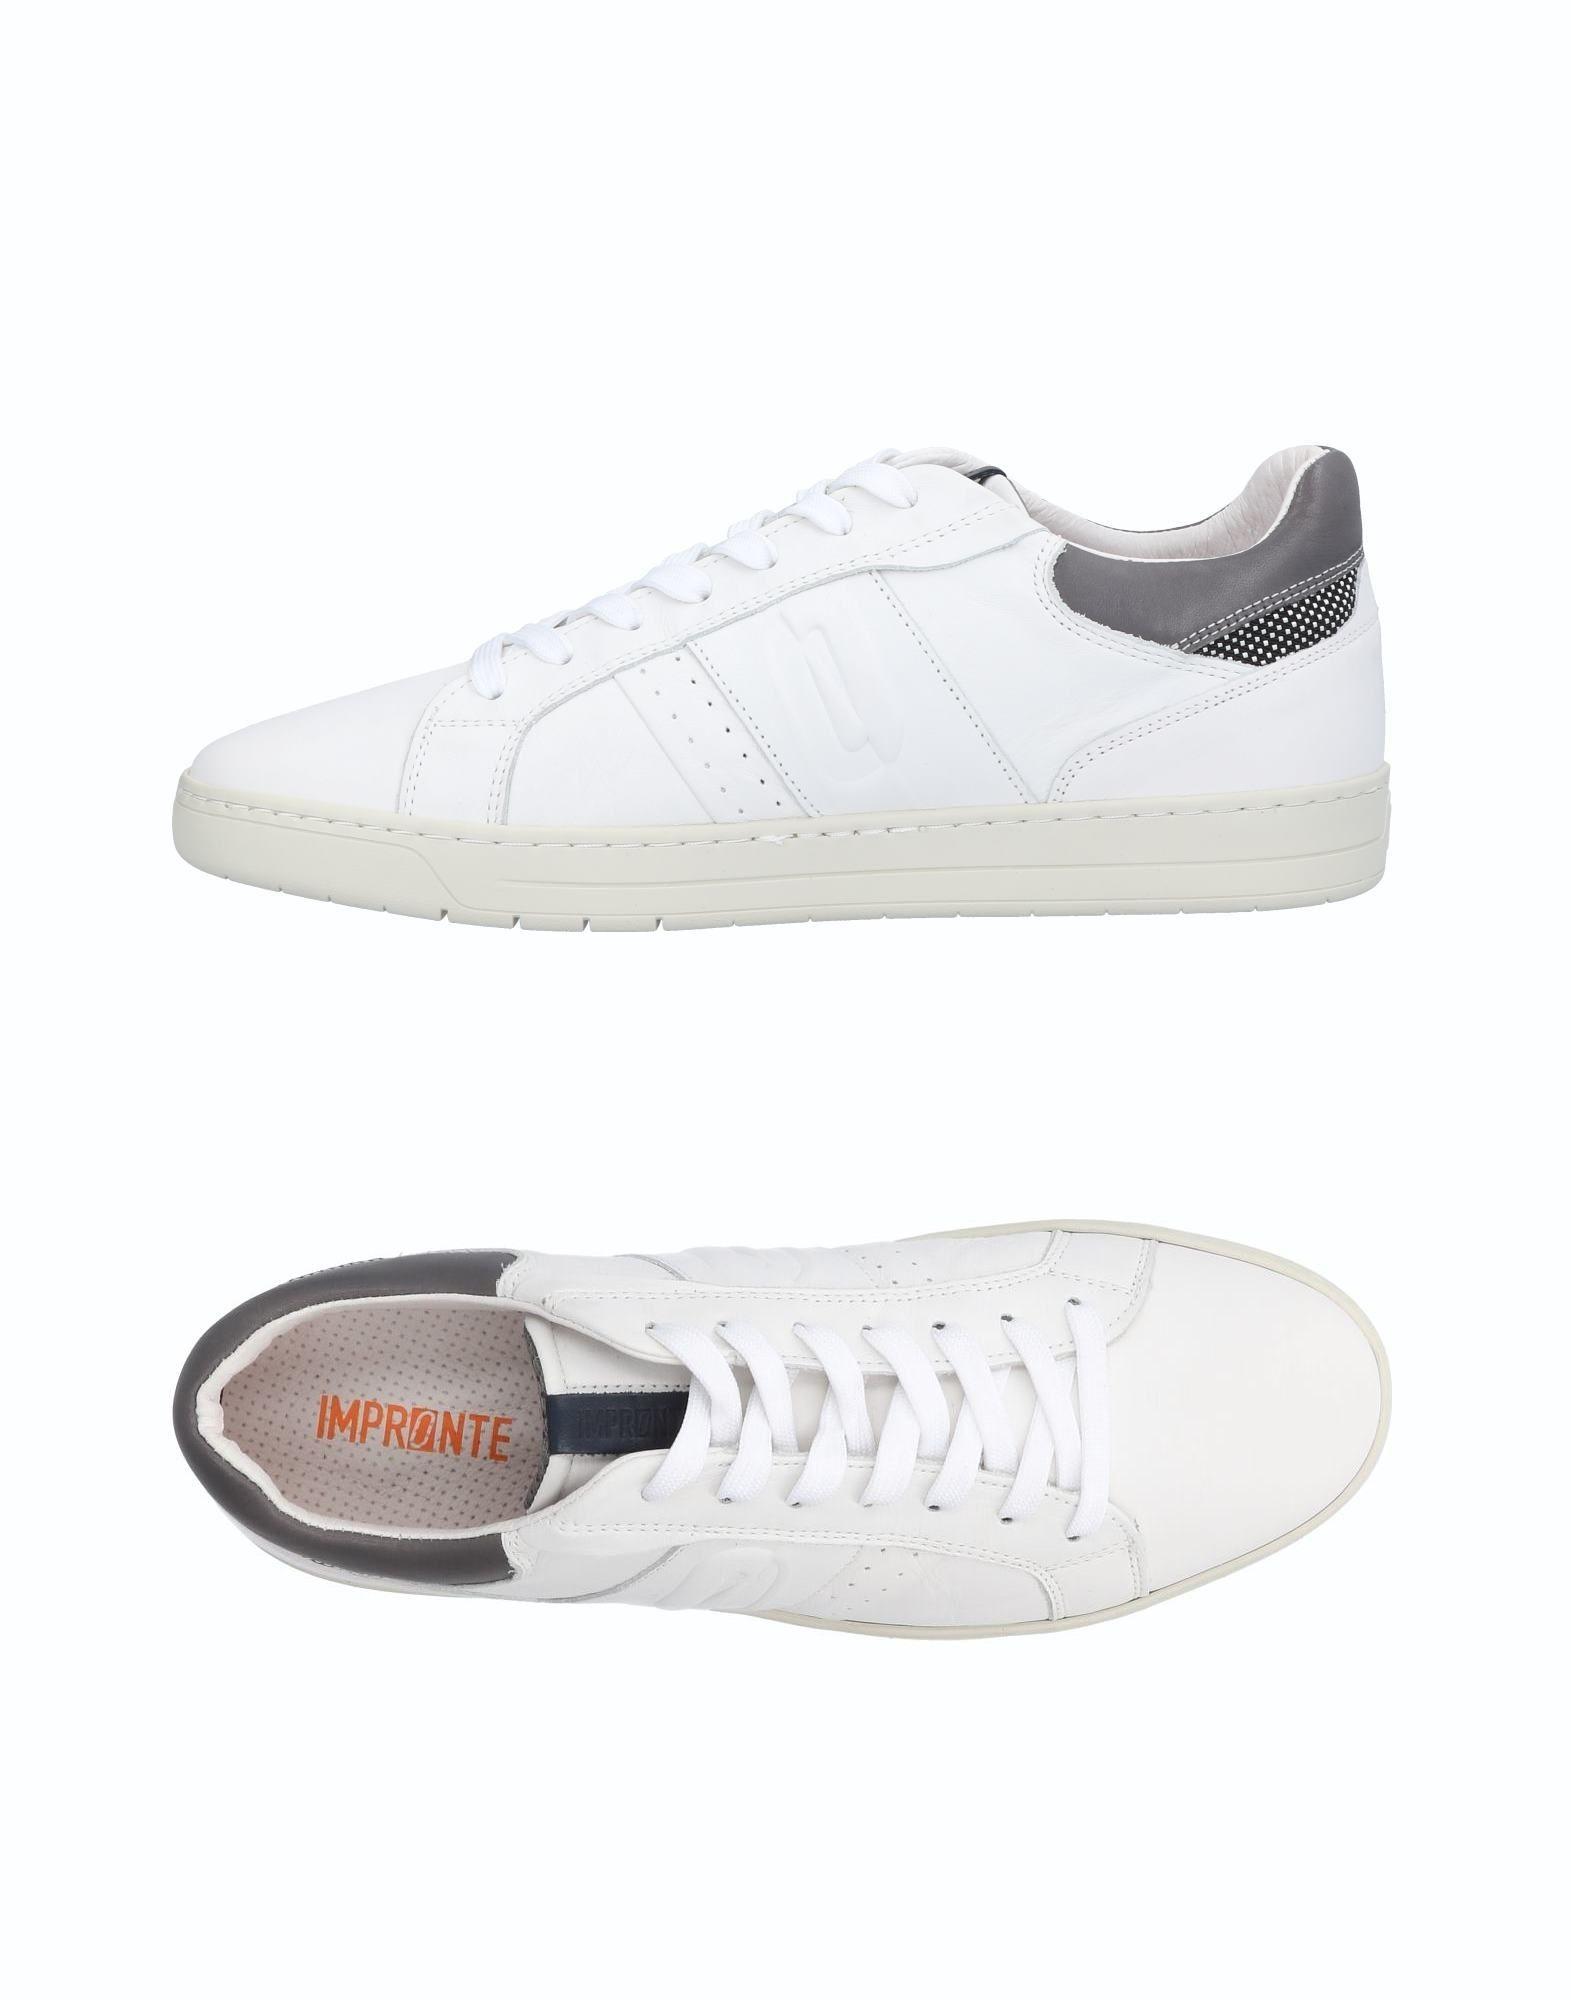 sale retailer e4f93 a1f62 Blanco Zapatillas Impronte Hombre Zapatillas - Zapatillas Hombre Impronte  Moda barata y hermosa 6695ff